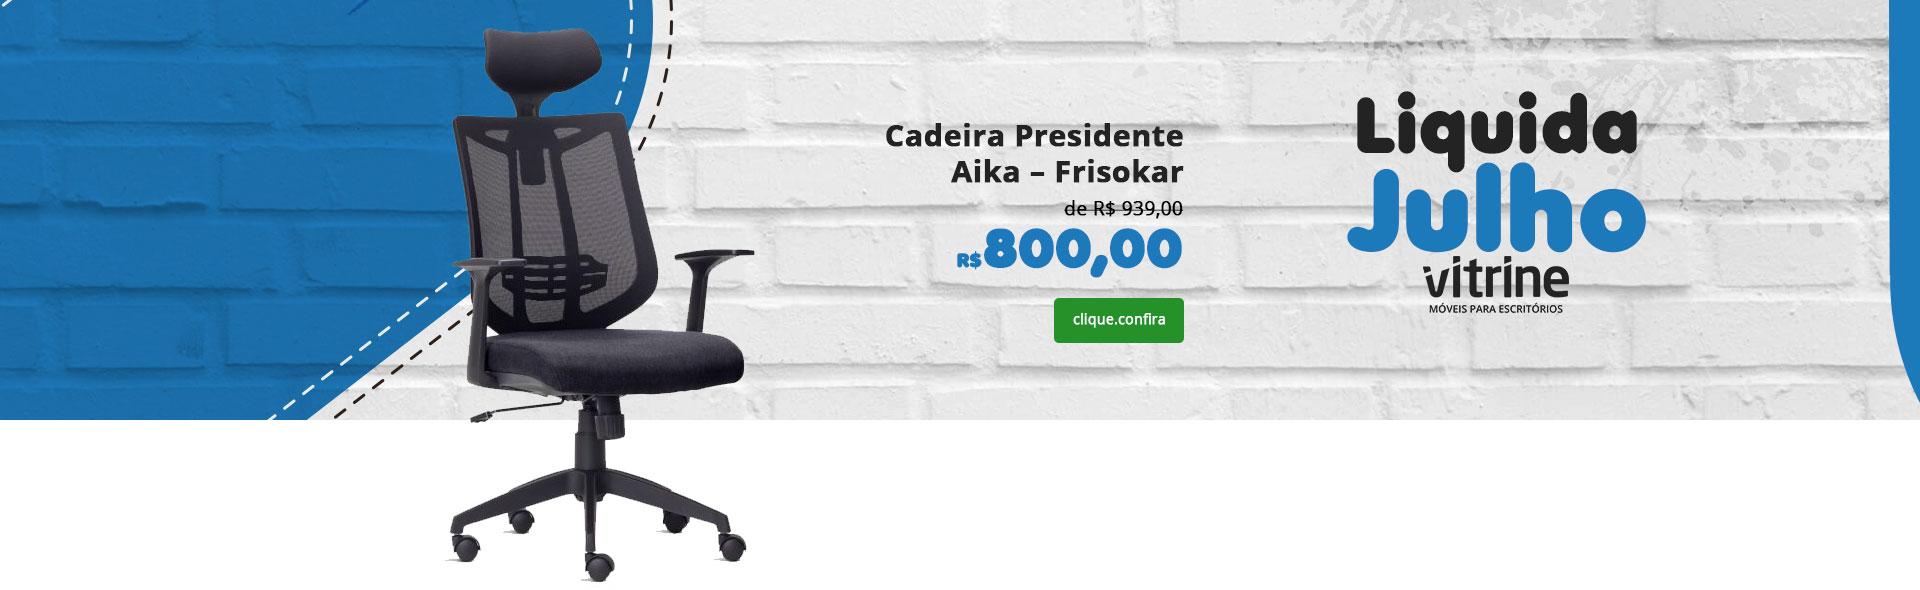 Cadeira Presidente Aika Slider